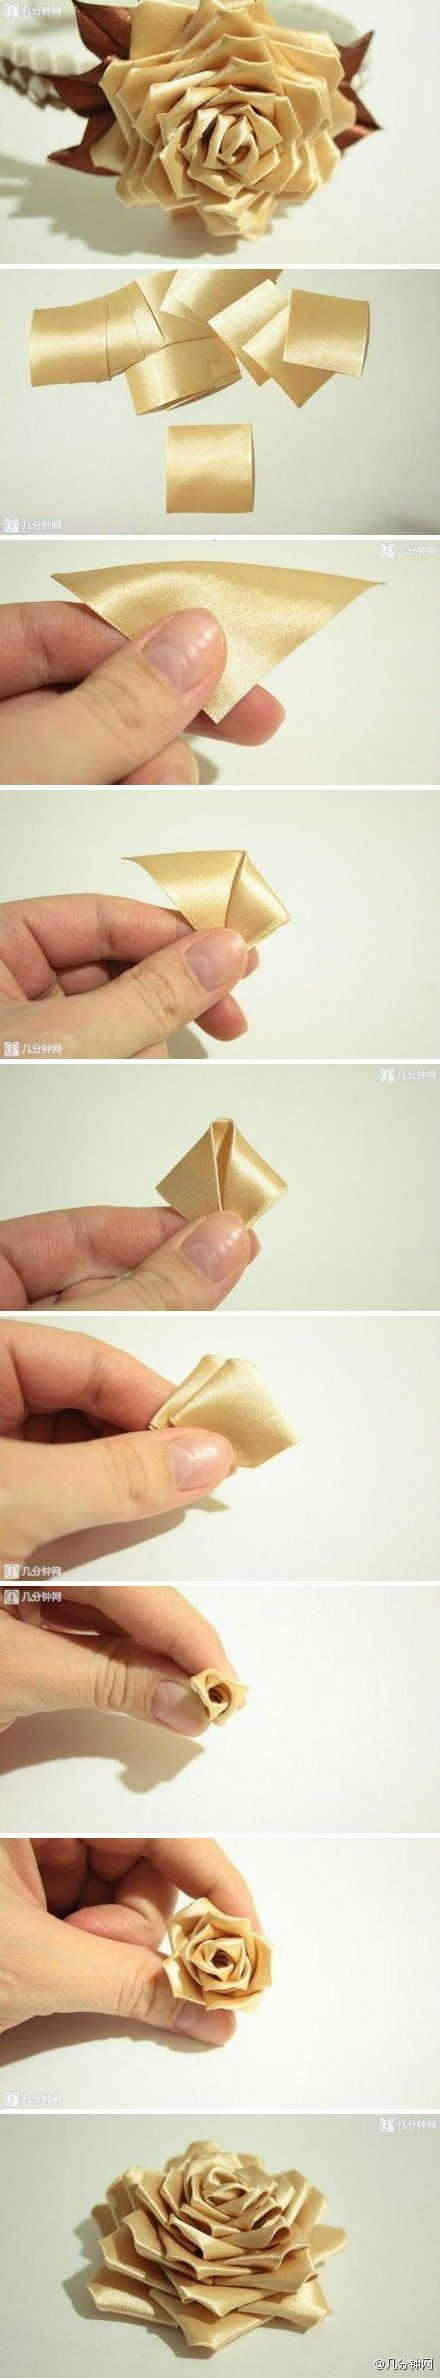 DIY Ribbon Modular Rose DIY Projects